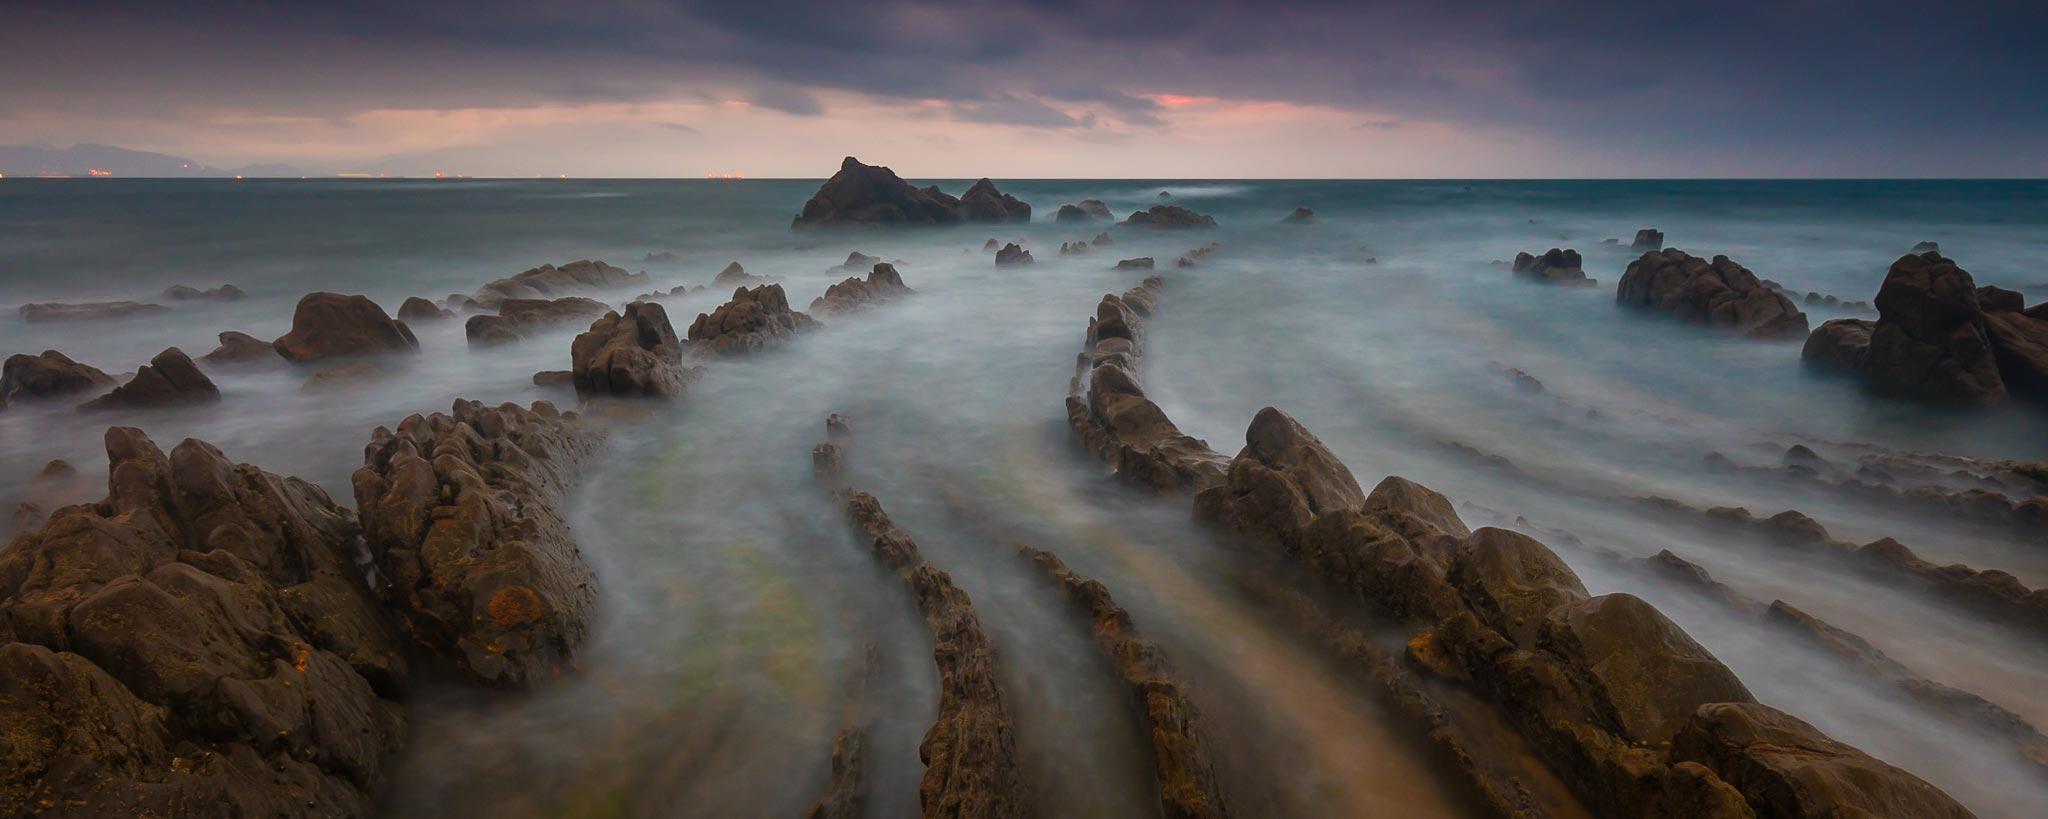 Playa de Barrika, Rafa Irusta